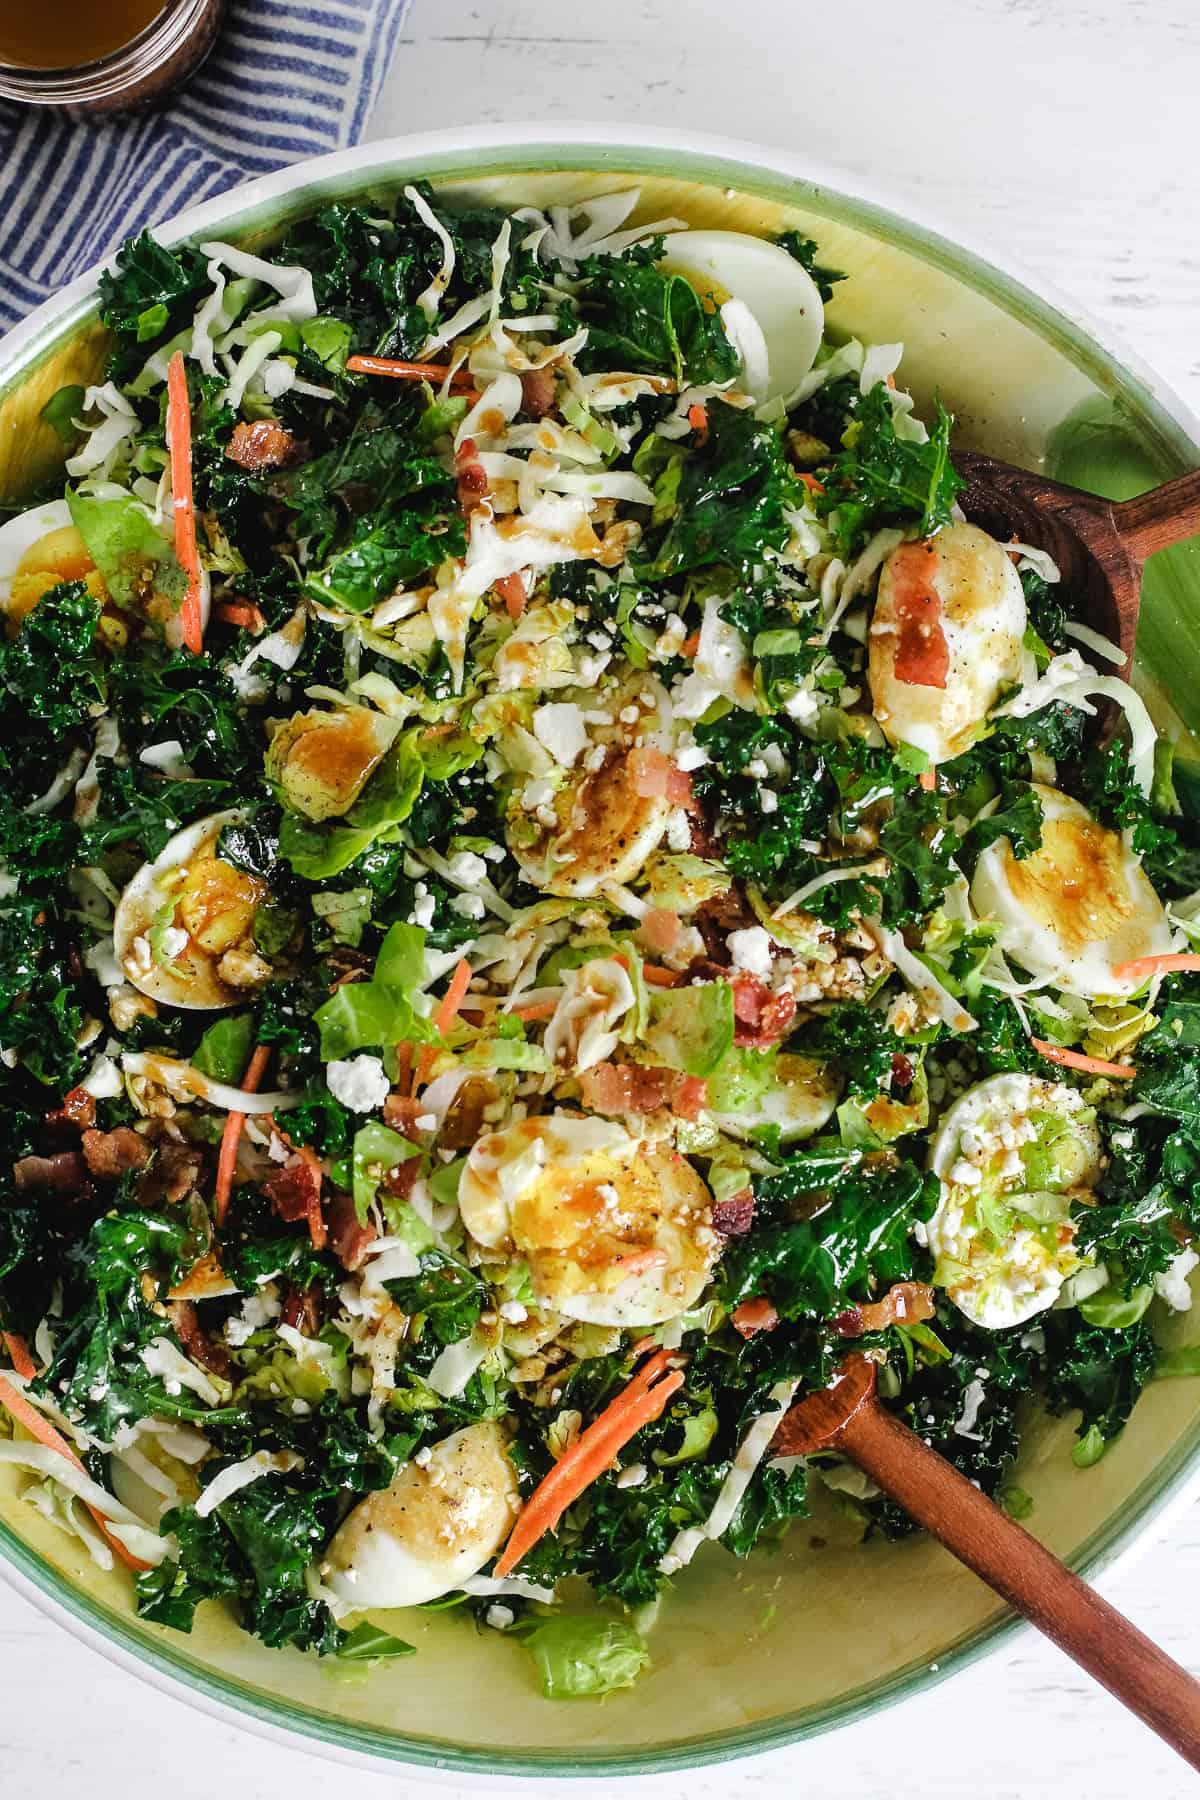 A large bowl of cruciferous salad with salad tongs.